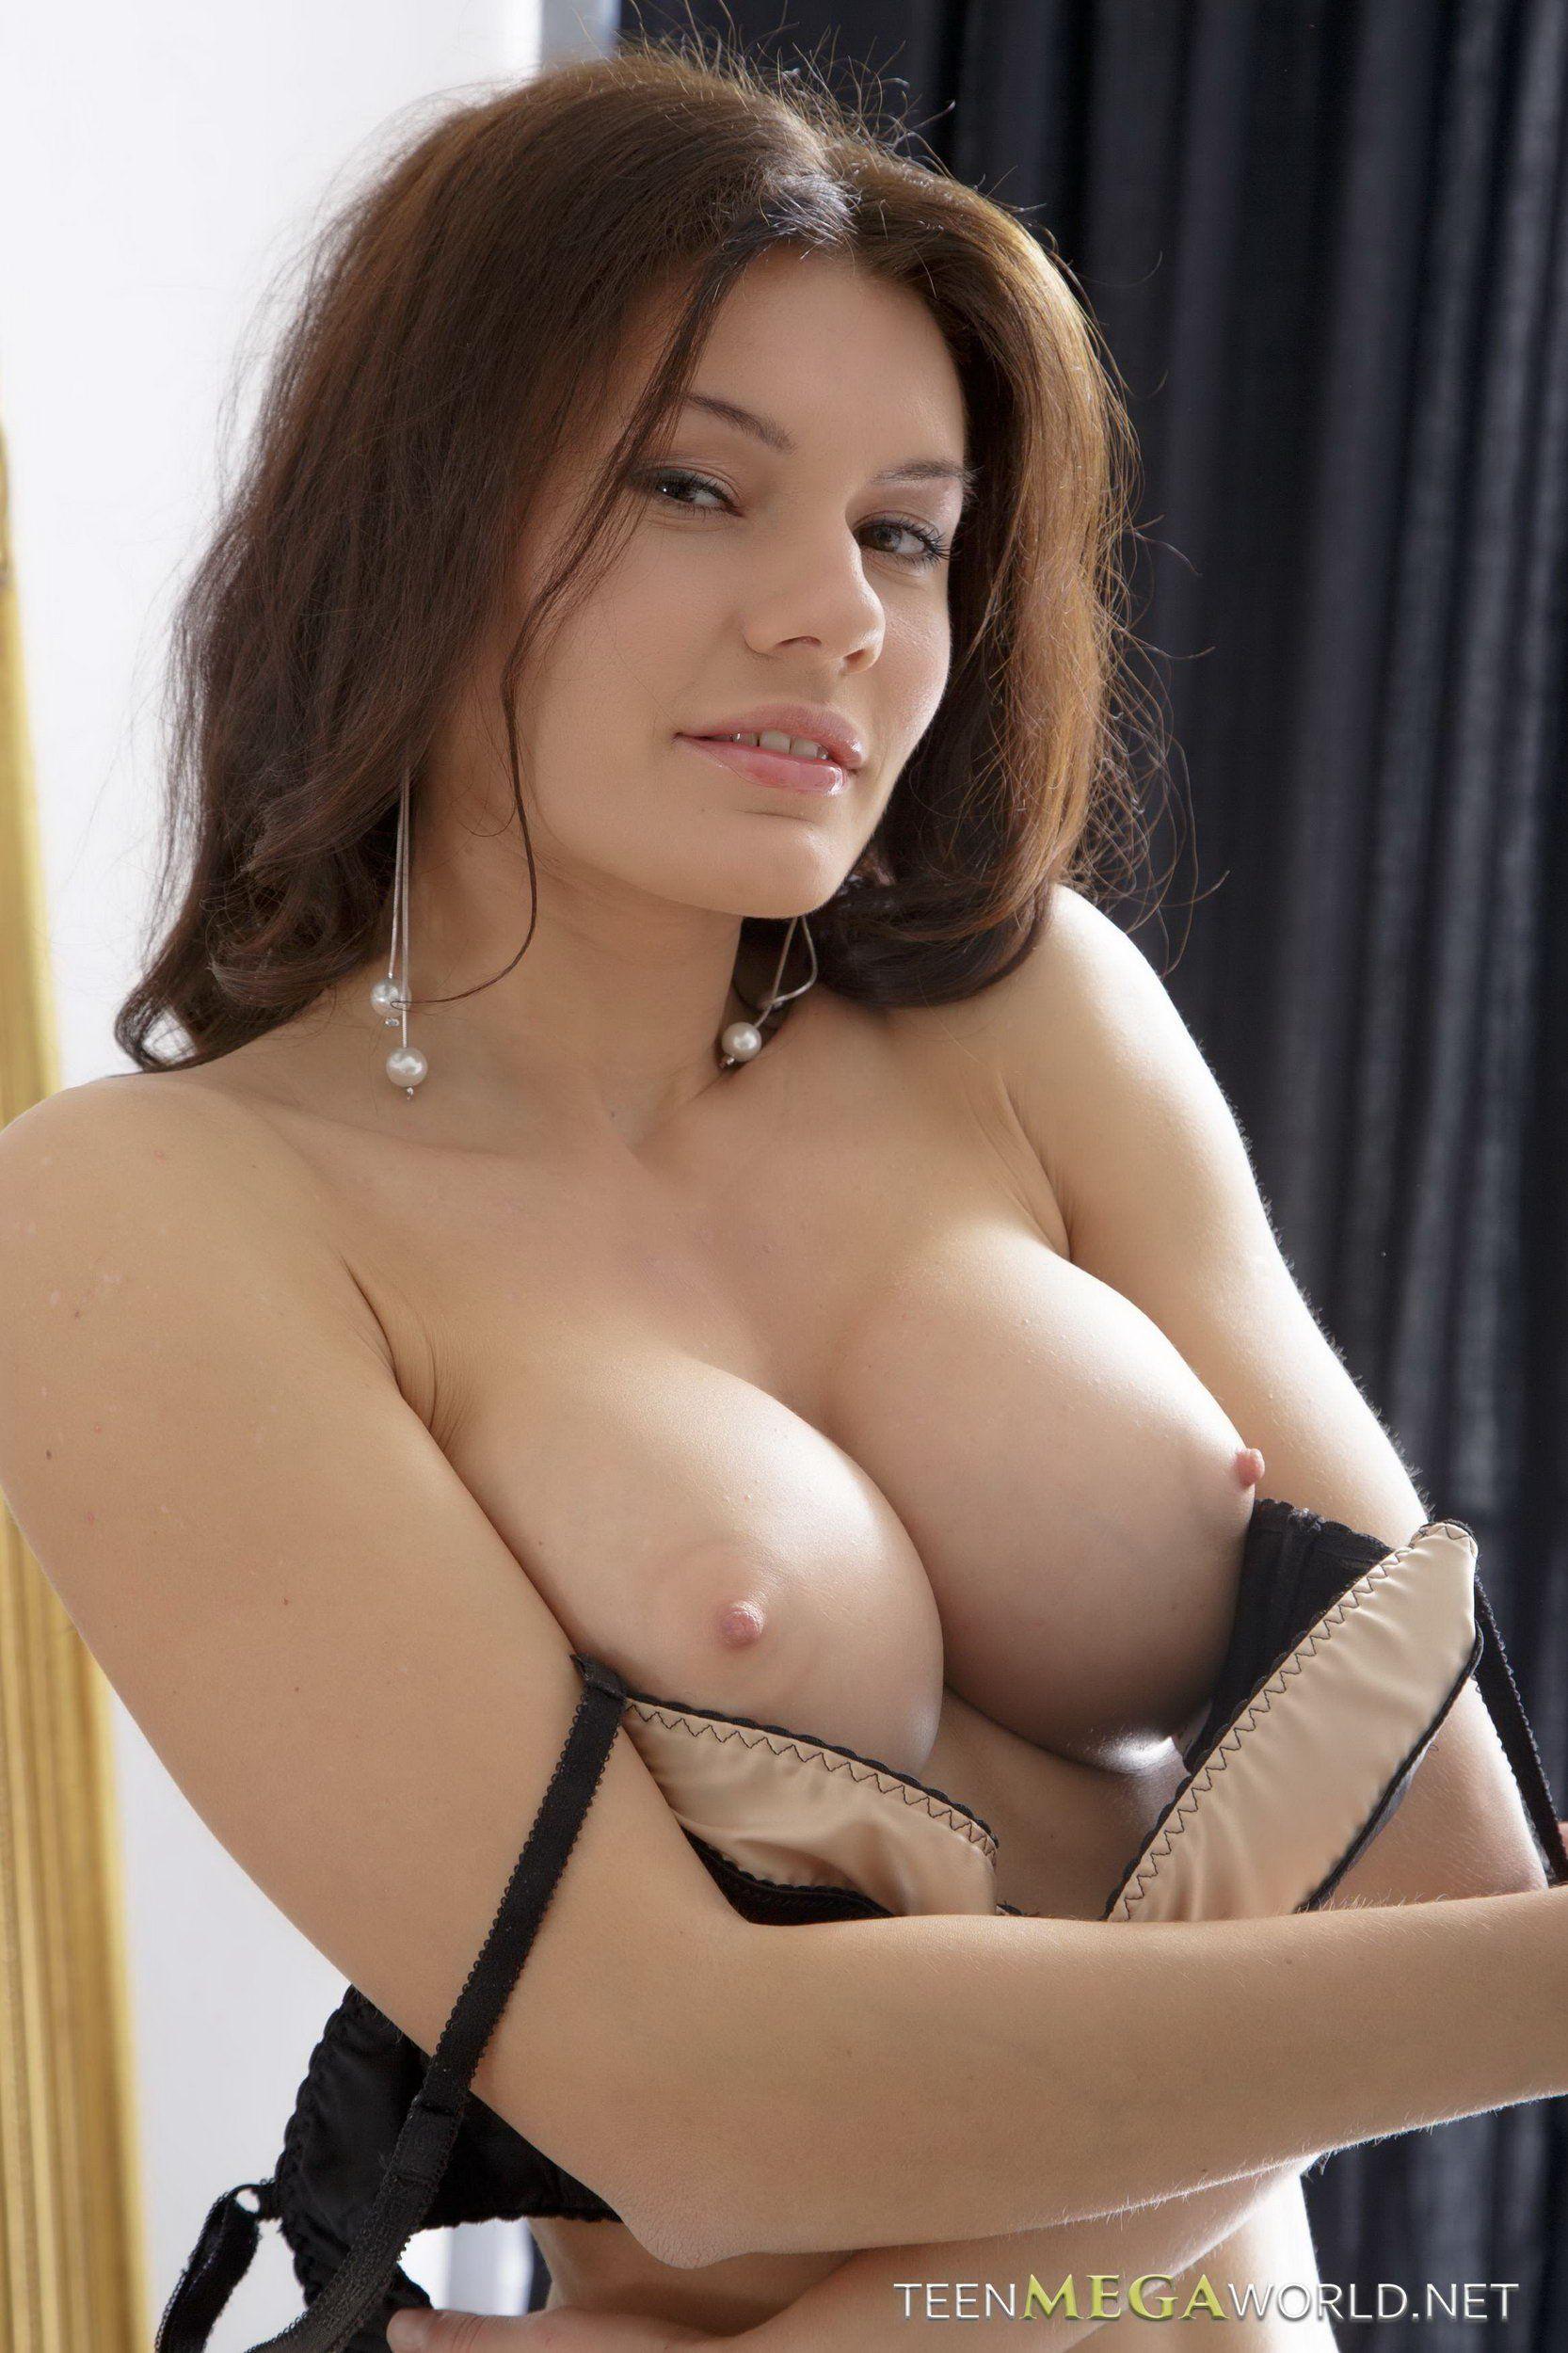 Sexy tennis nude babes